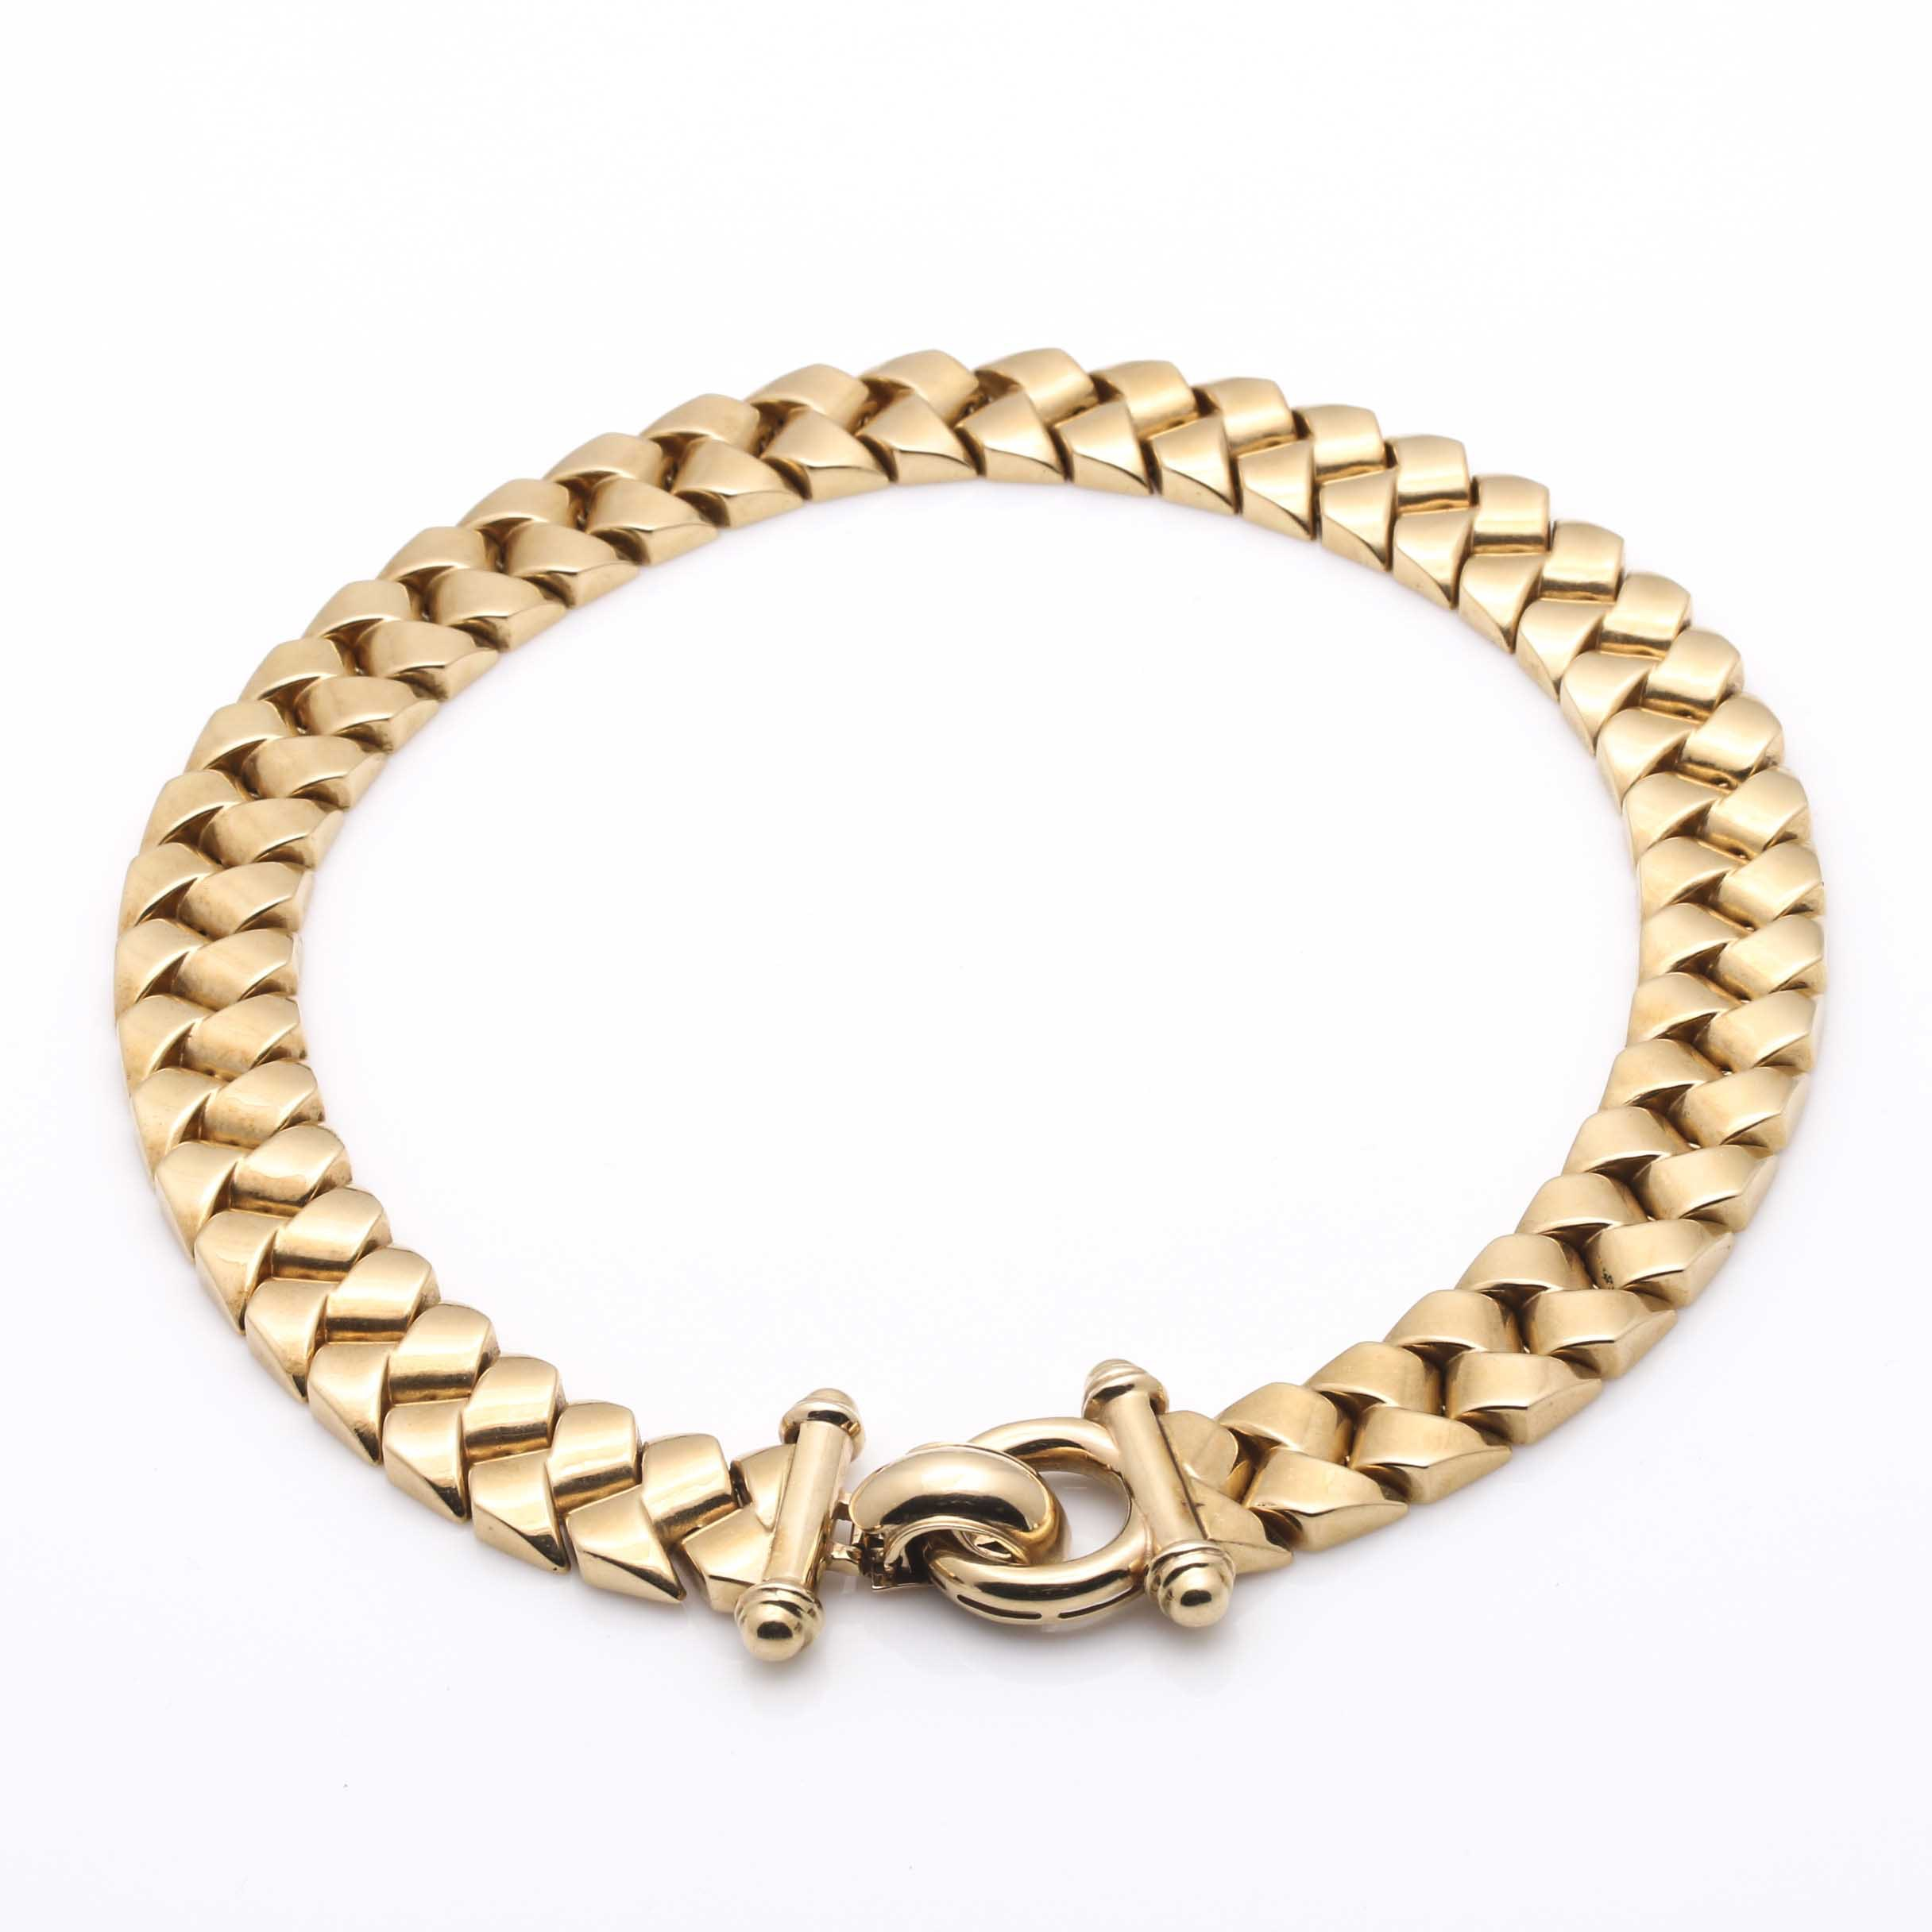 Kitsinian 14K Yellow Gold Necklace